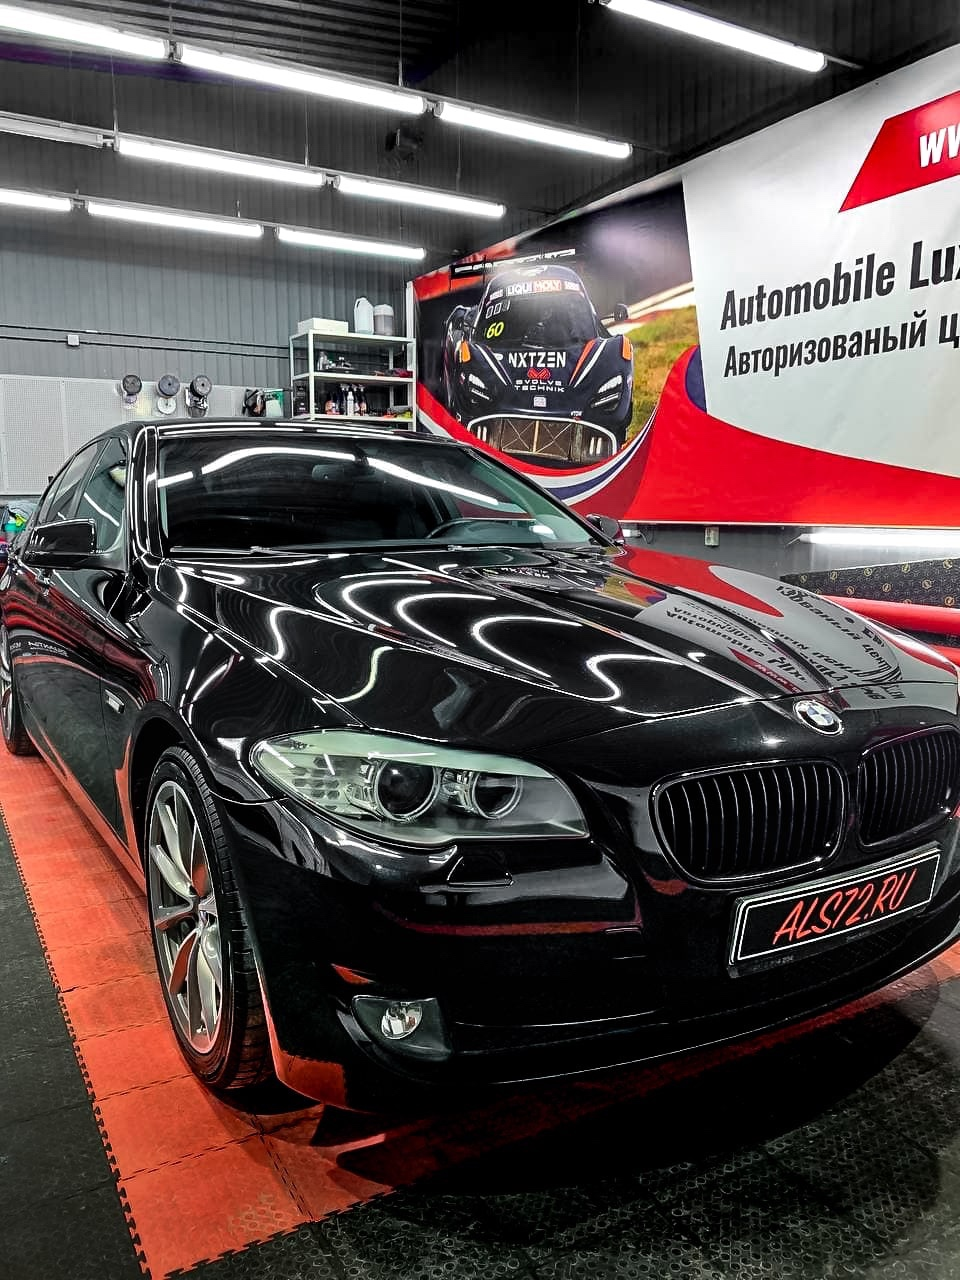 BMW 5: полировка, керамика, химчистка салона - детейлинг в Тюмени